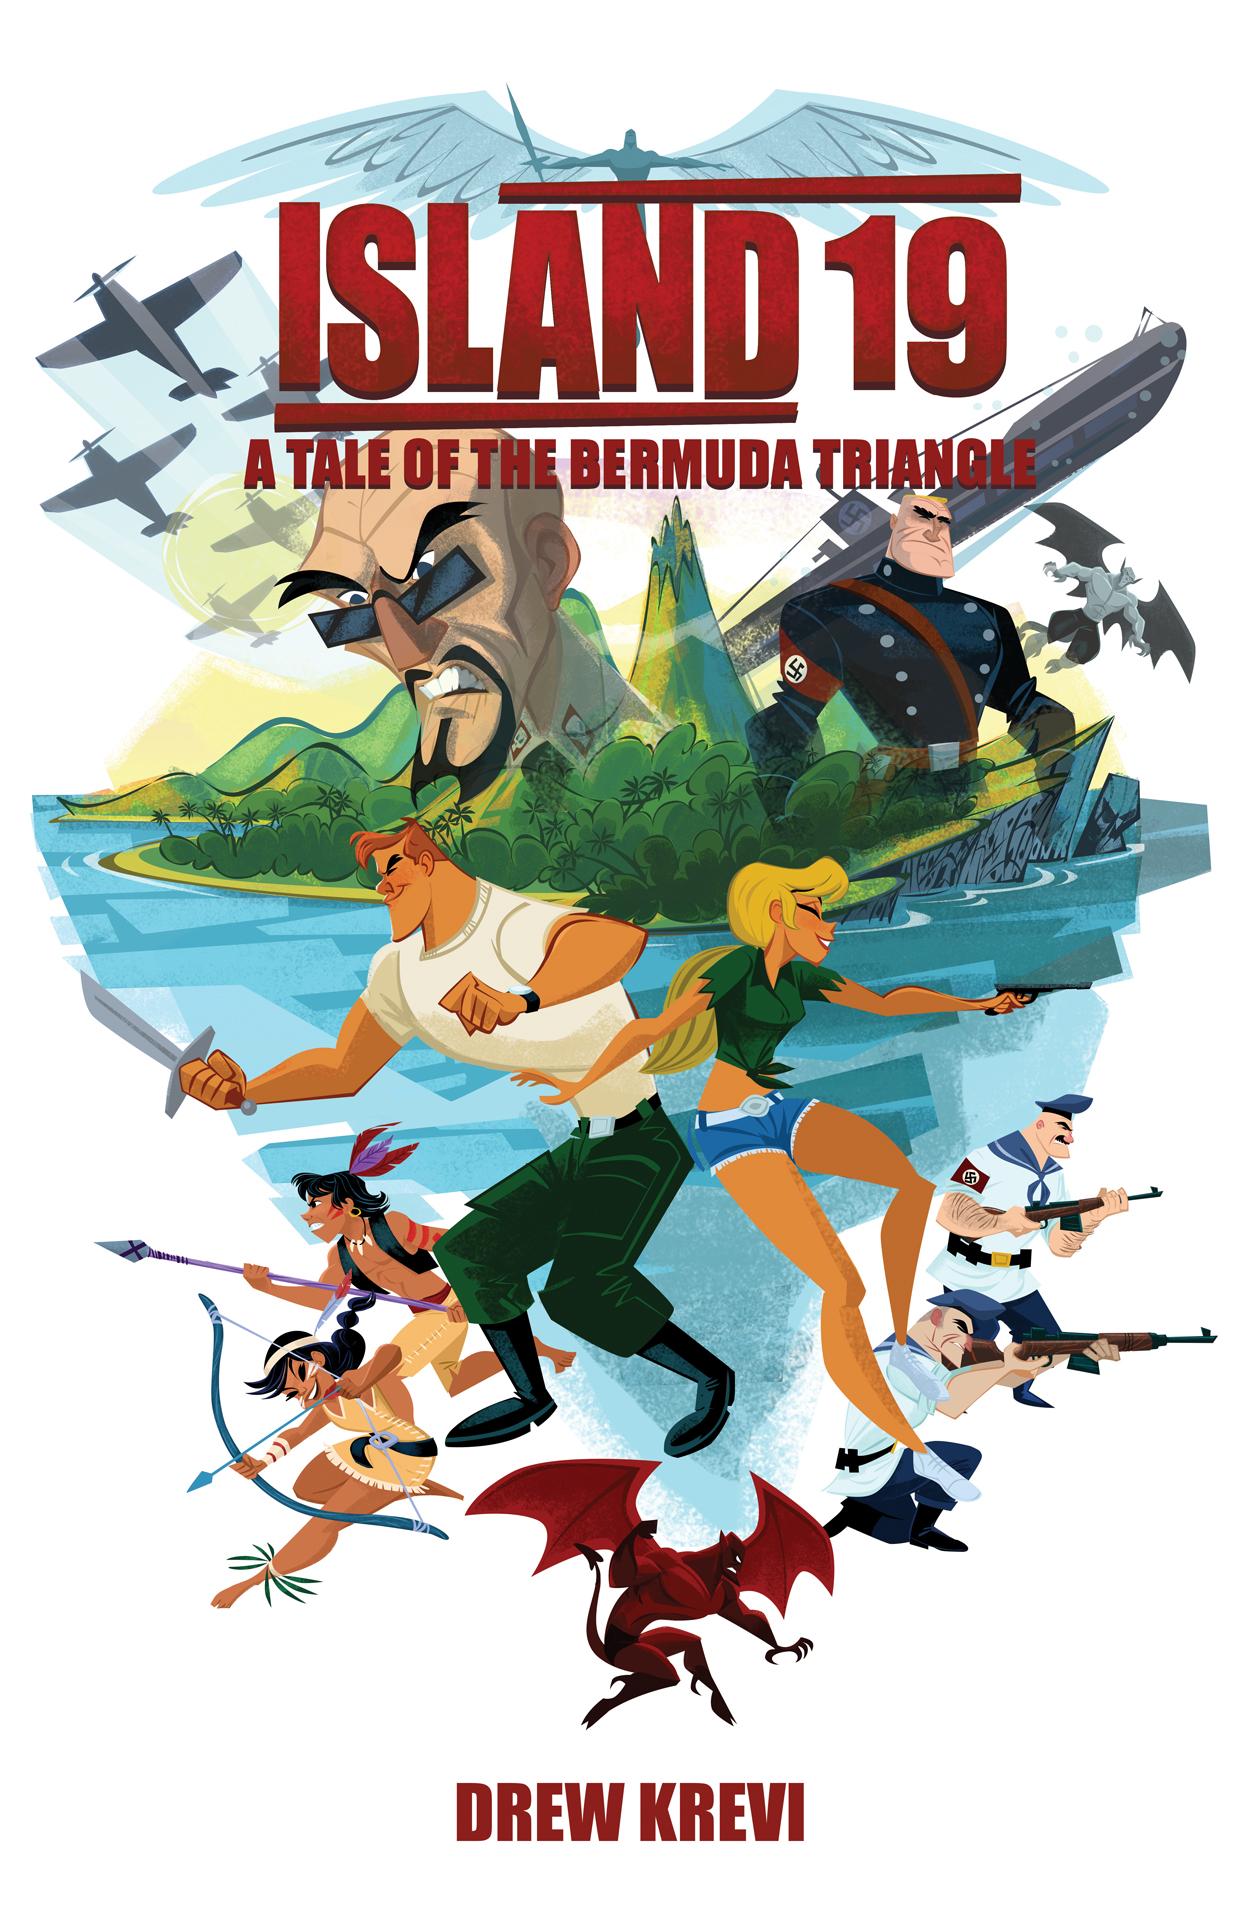 Island 19: A Tale of the Bermuda Triangle